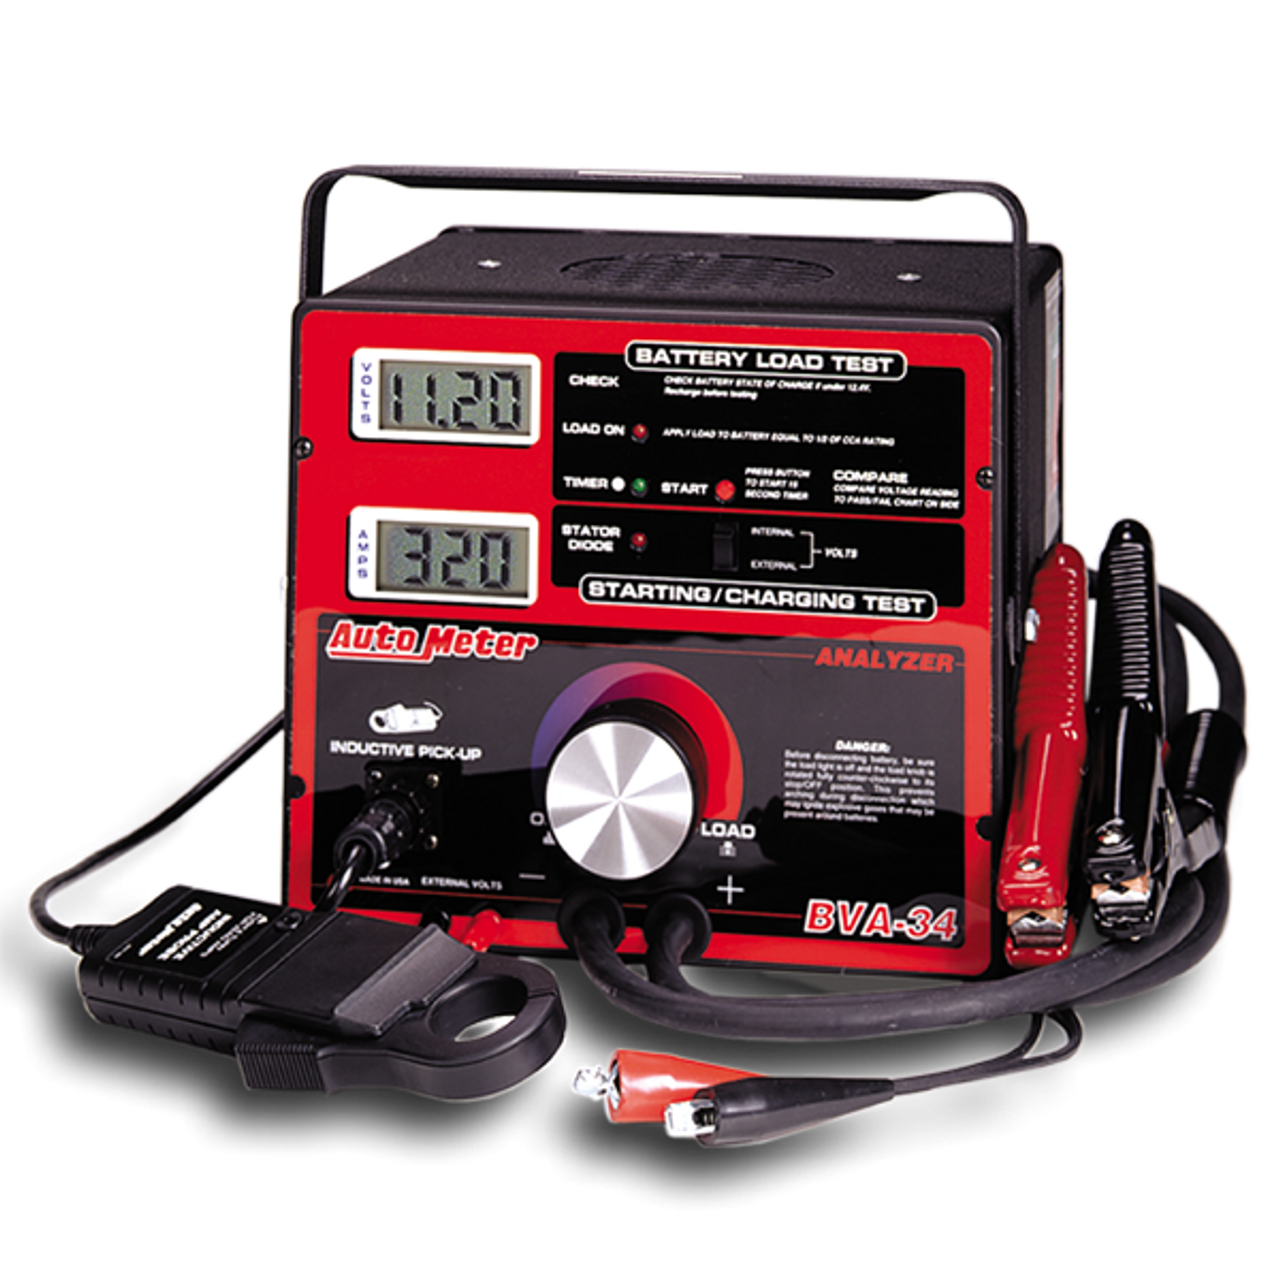 6v 12v 500 Amp Carbon Pile Battery Load Tester Alternator Starter 1000a Testing